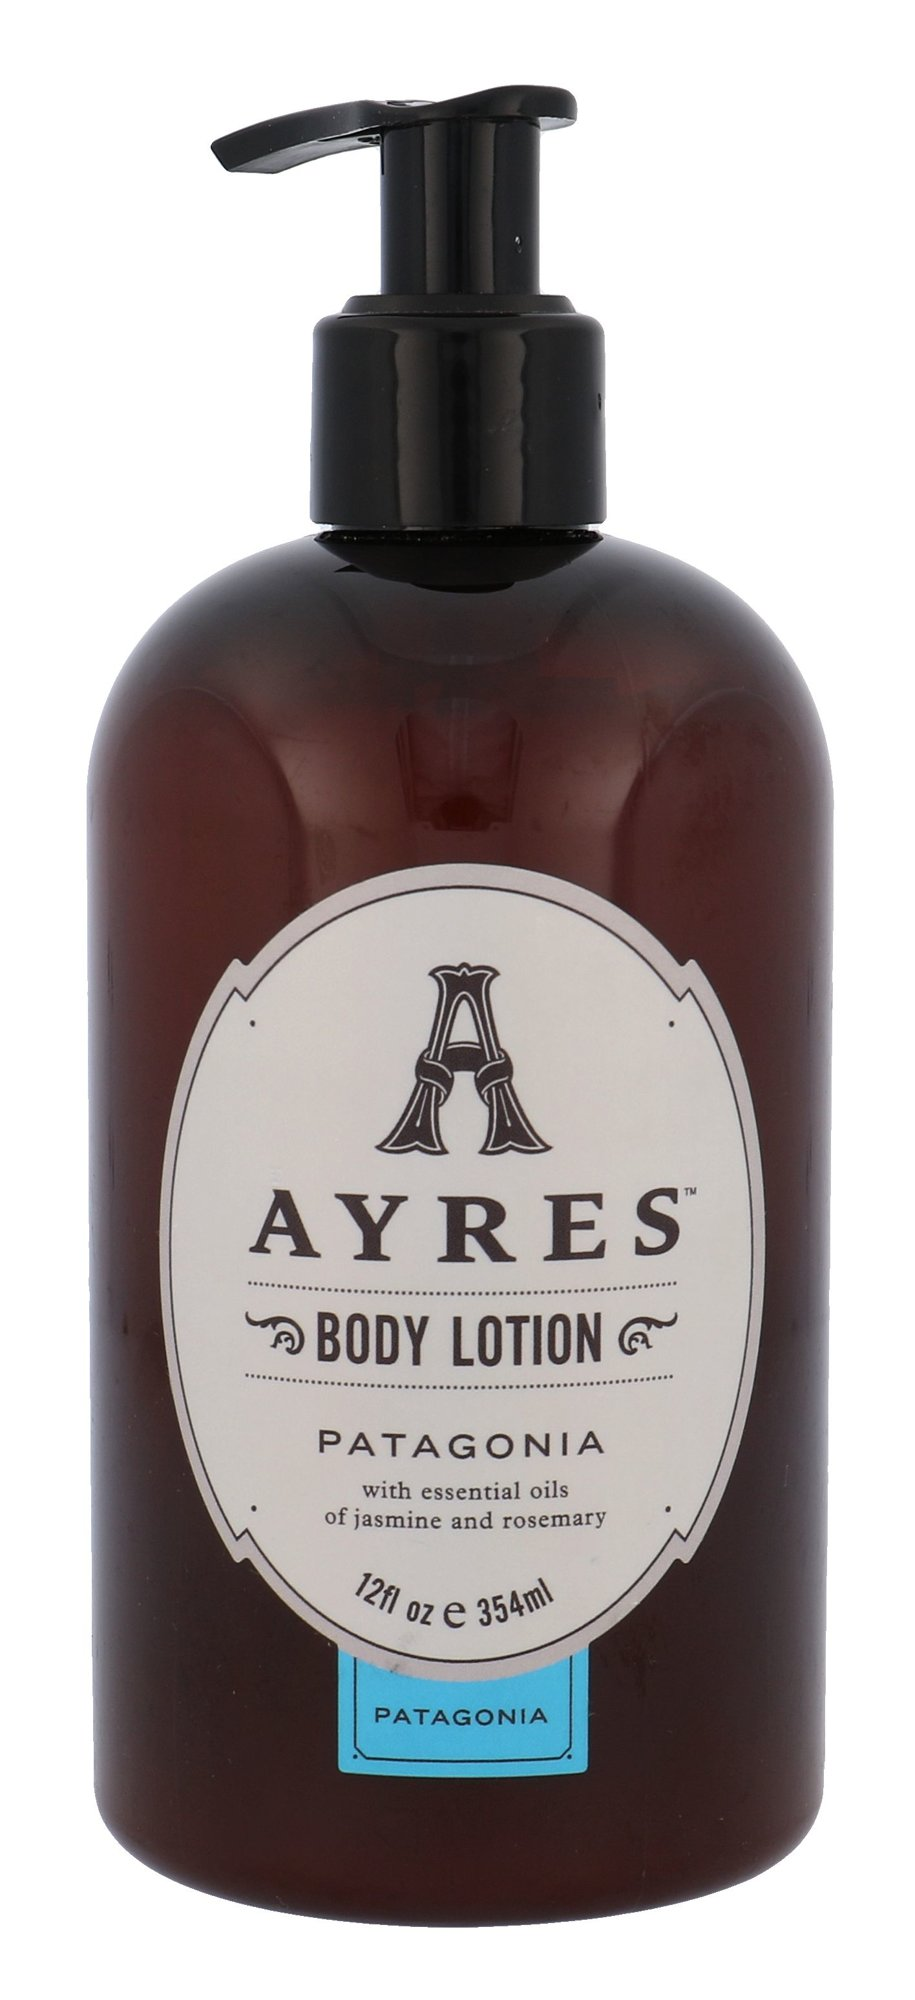 Ayres Patagonia Body Lotion Cosmetic 354ml